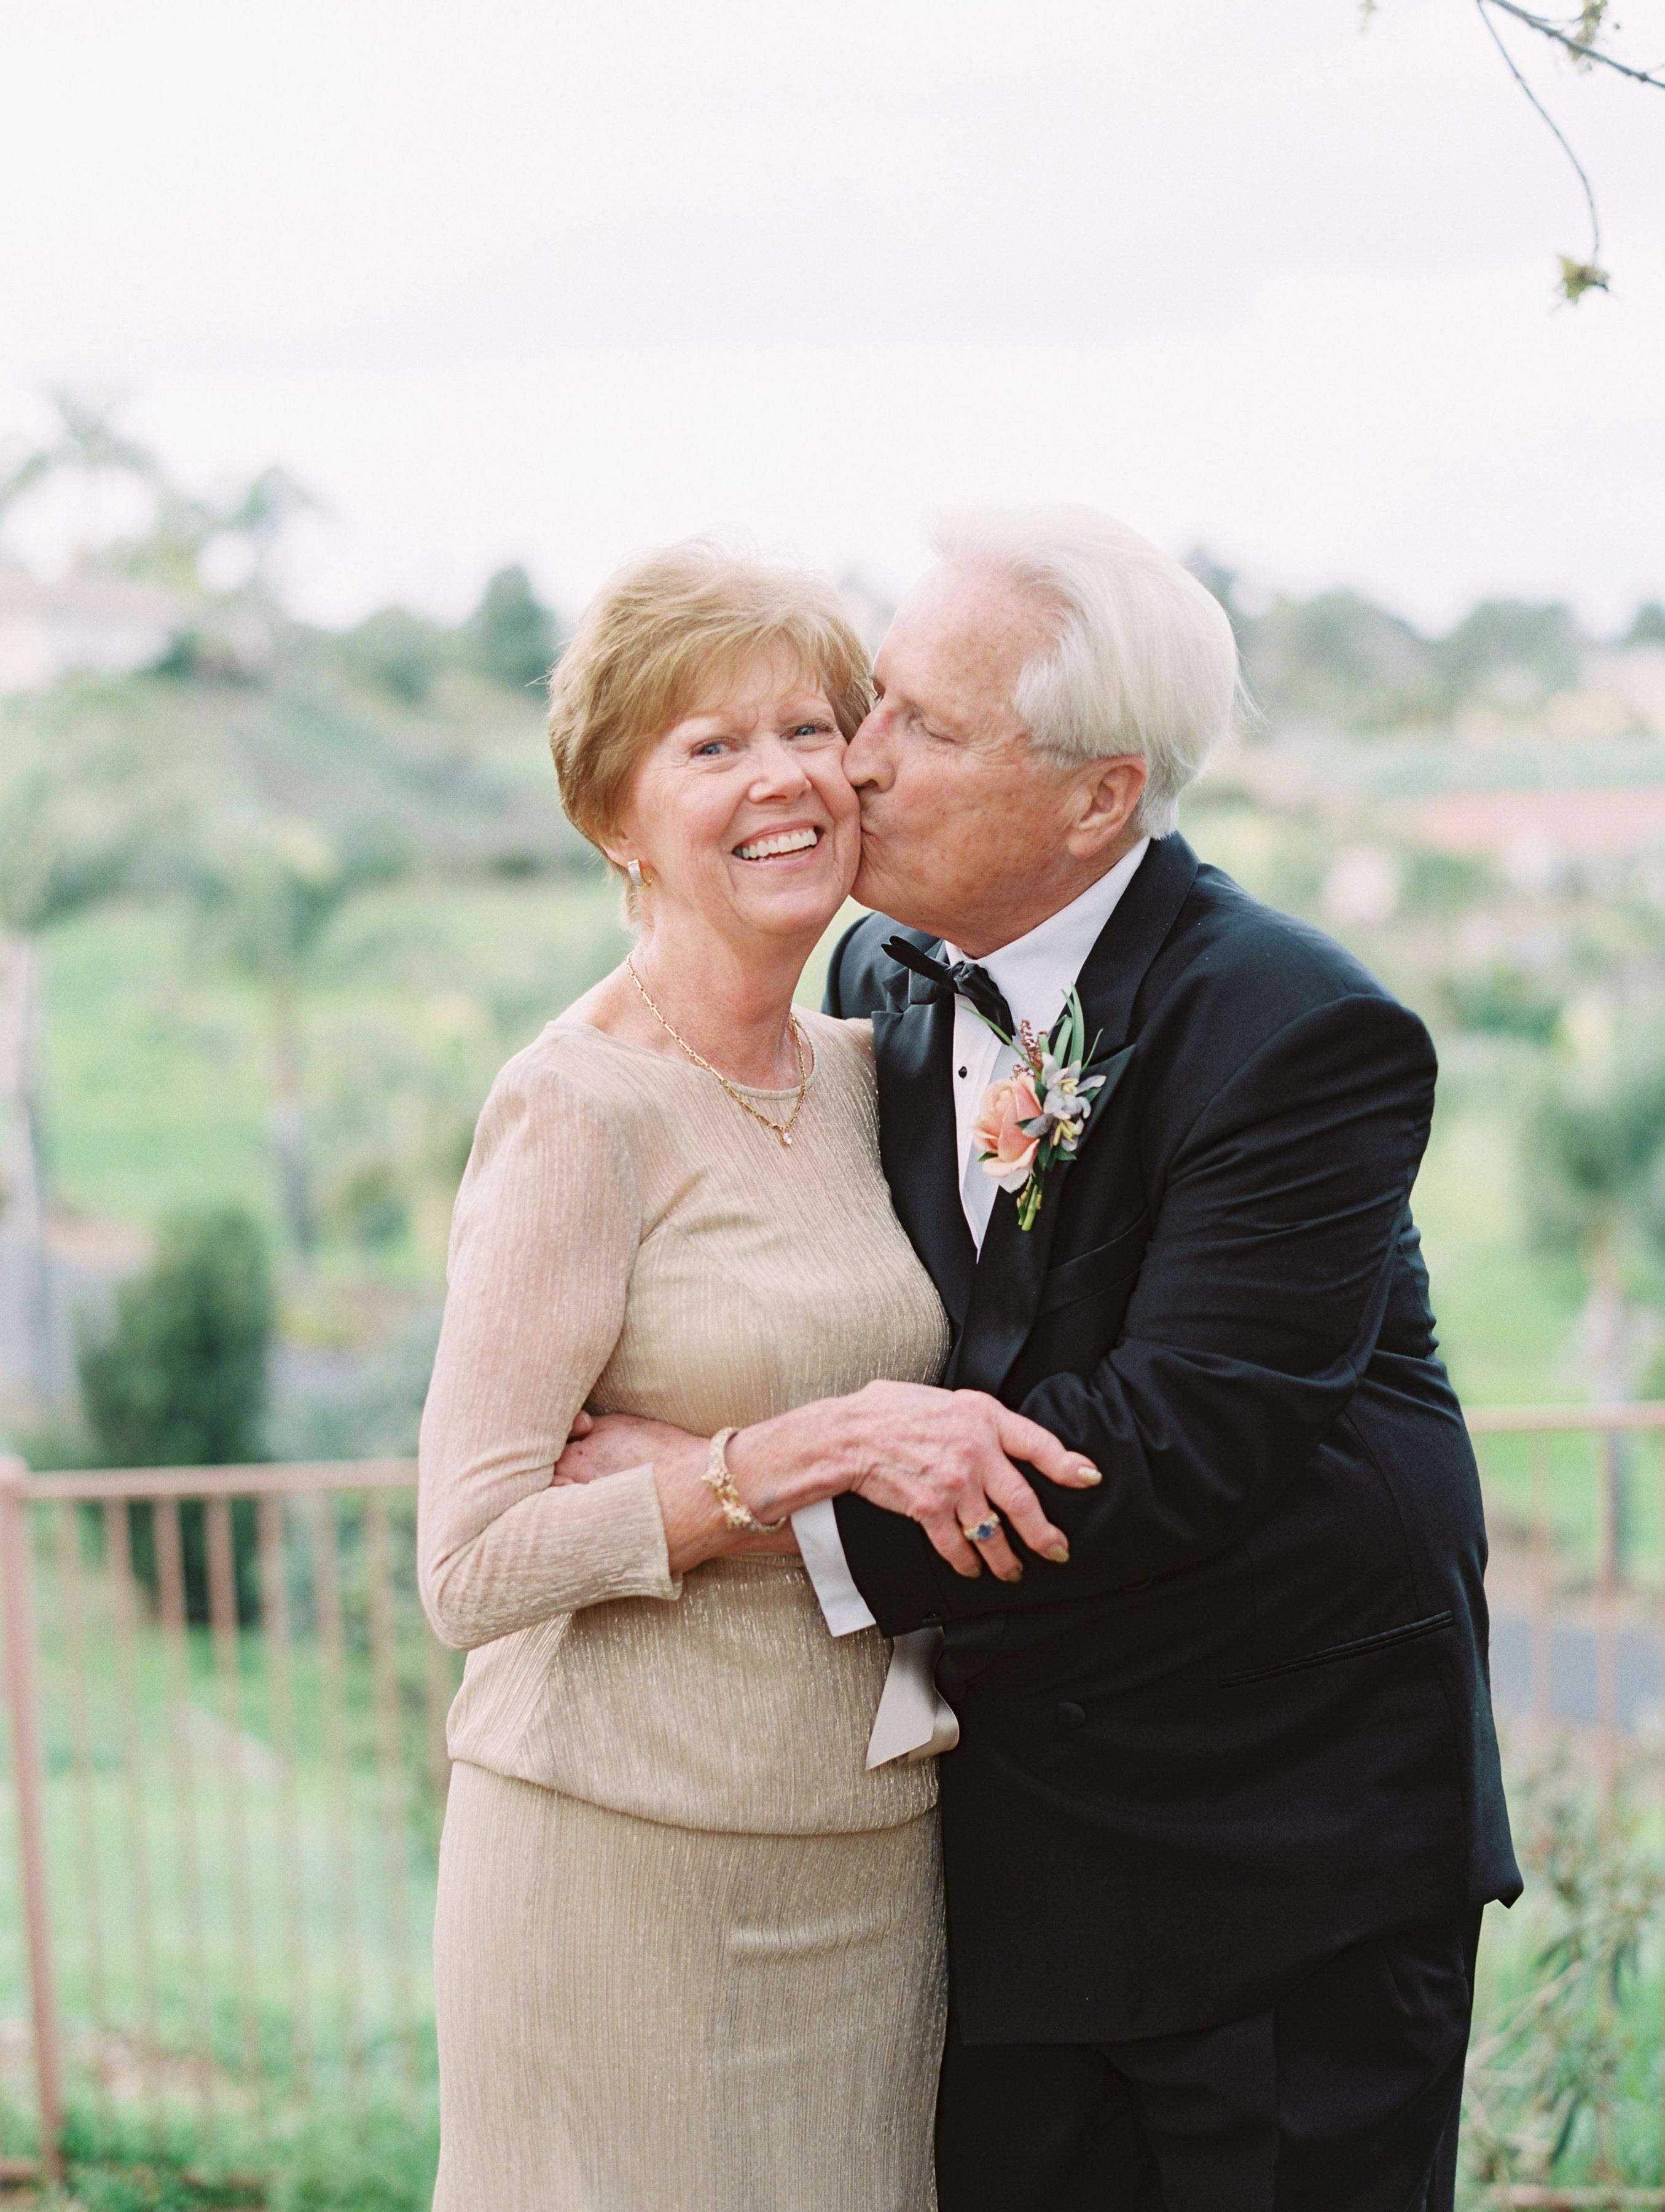 surprise wedding parents kiss on cheek